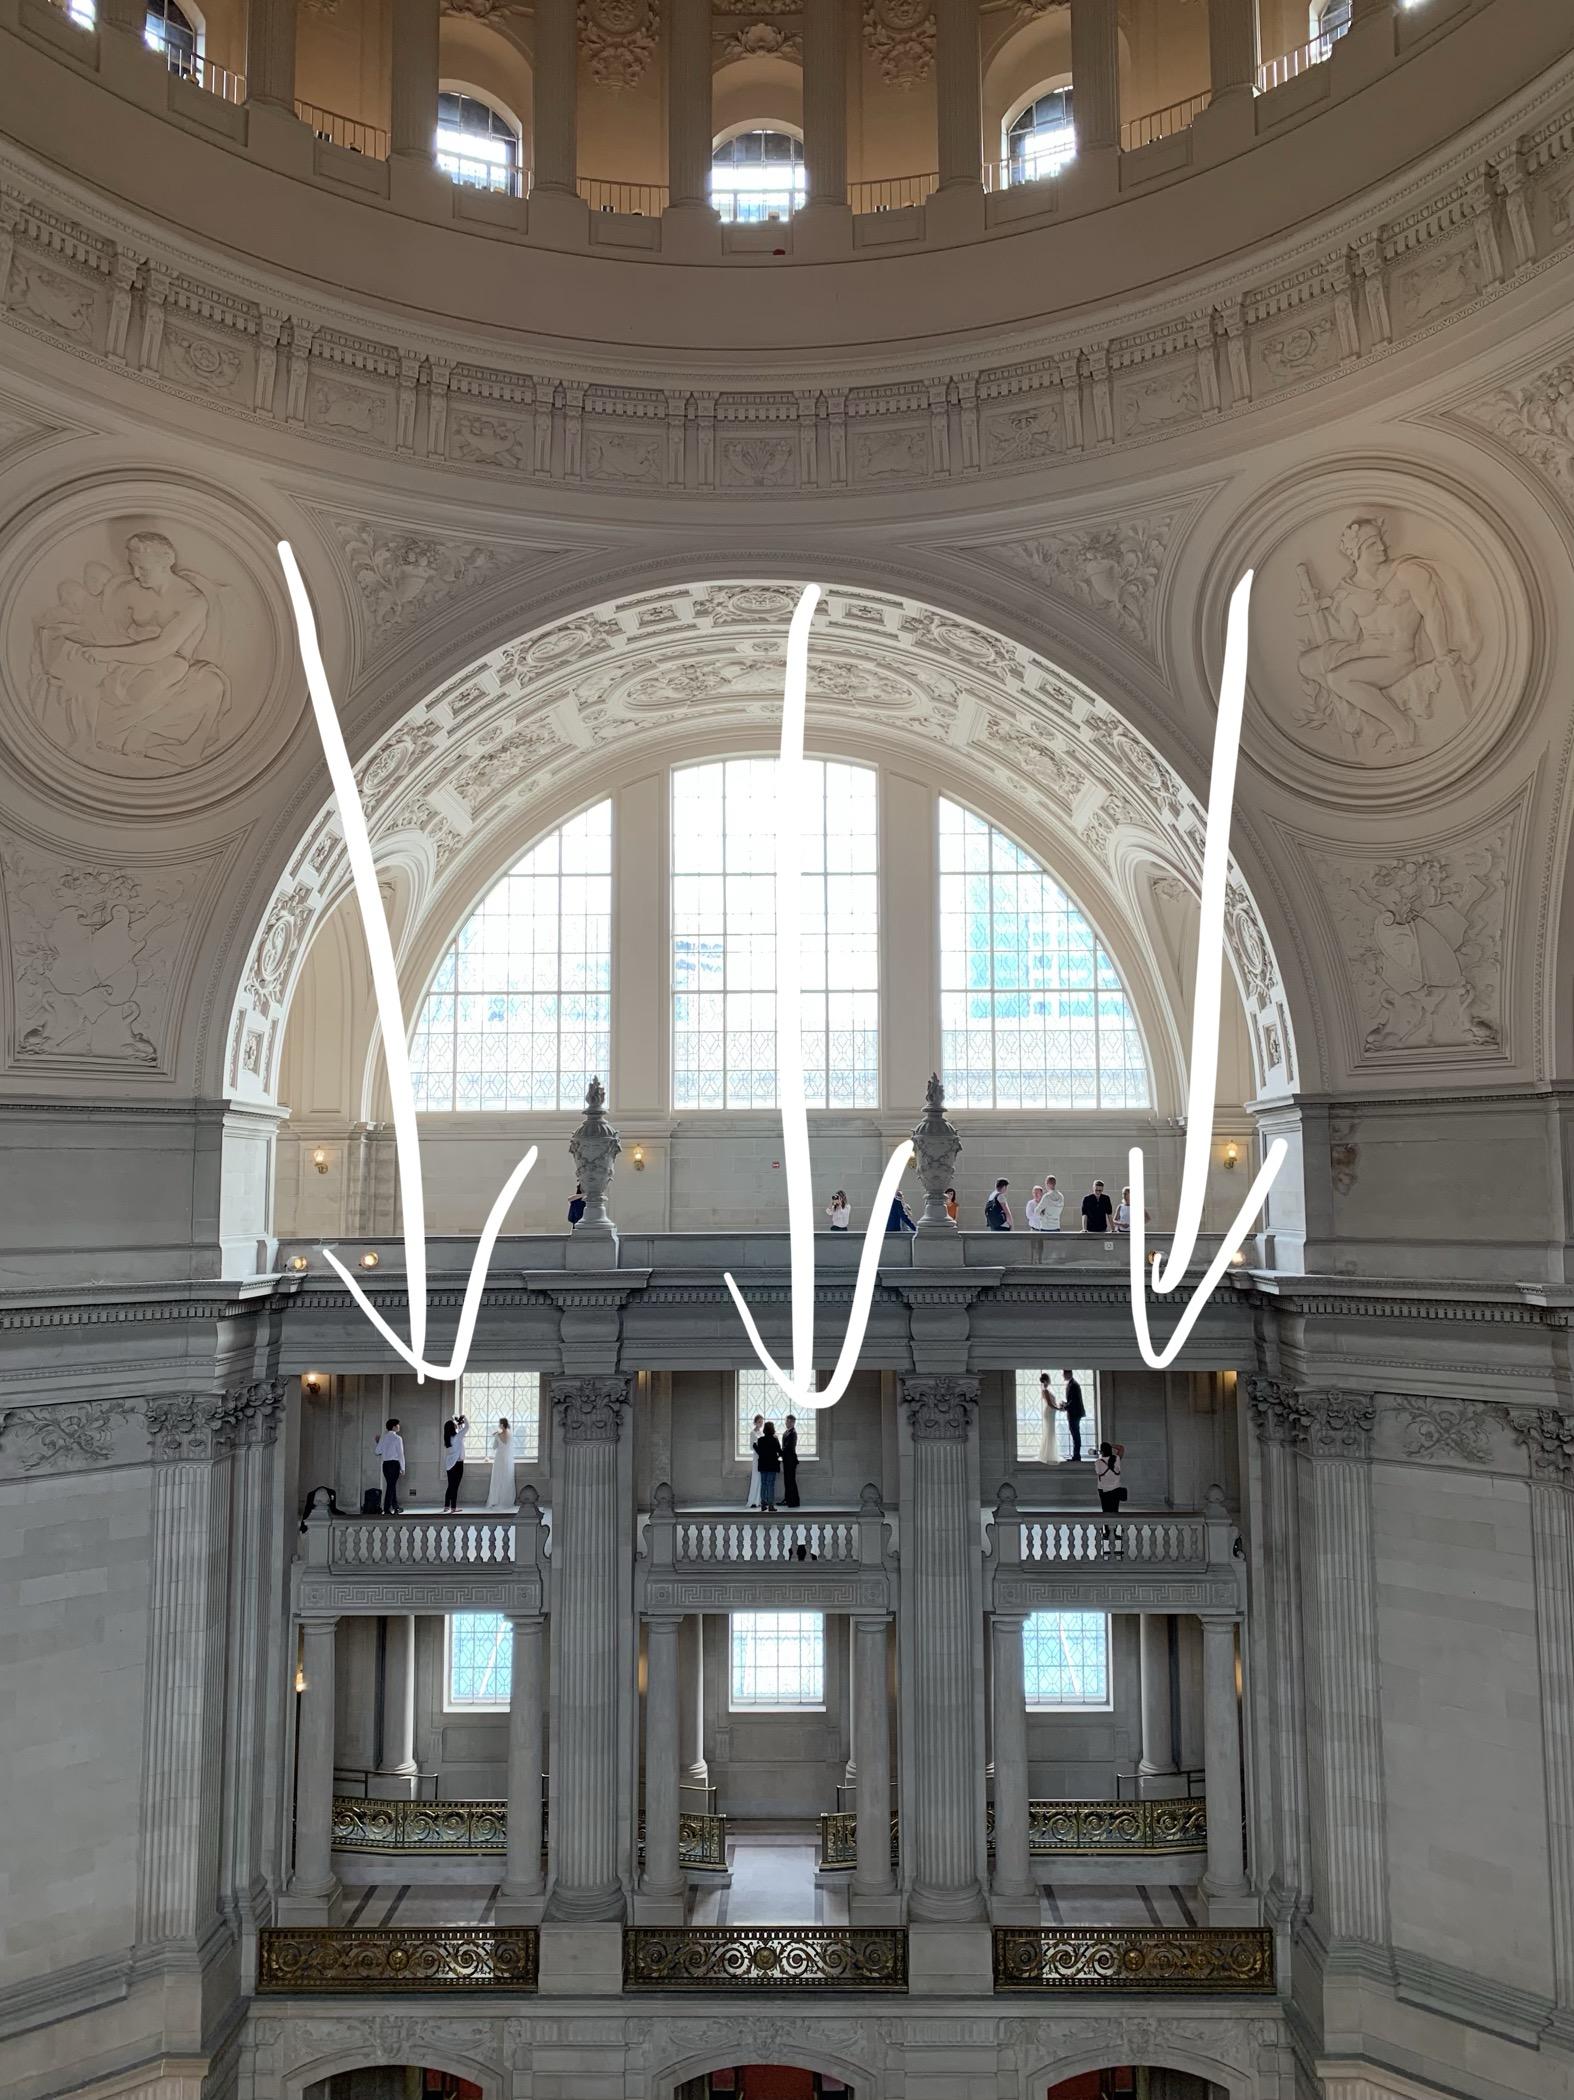 Photographers using the window lights at SF city hall